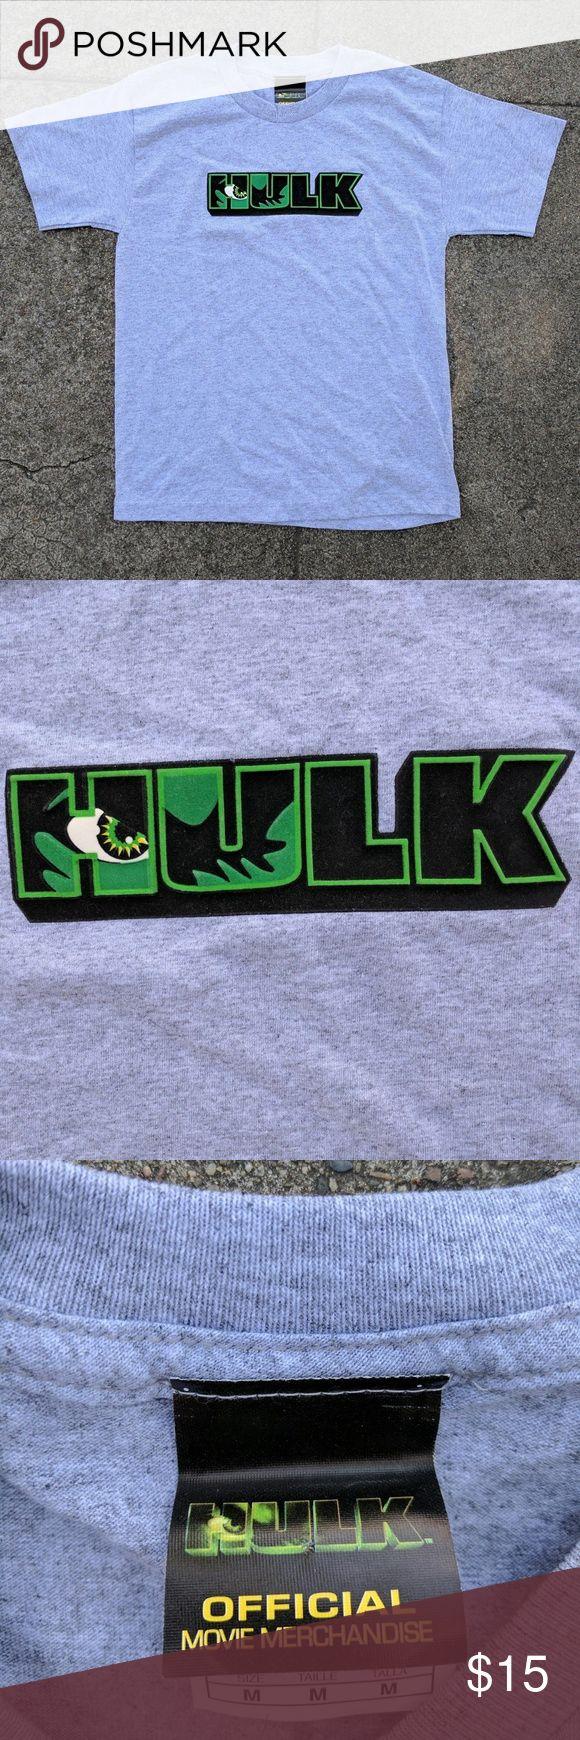 2003 HULK movie t-shirt 2003 HULK movie t-shirt Size Kids M #hulk #marvel #mcu #marvelcinematicuniverse #brucebanner #ericbana #2003 #movies #comicbook #hollywood Marvel Shirts & Tops Tees - Short Sleeve